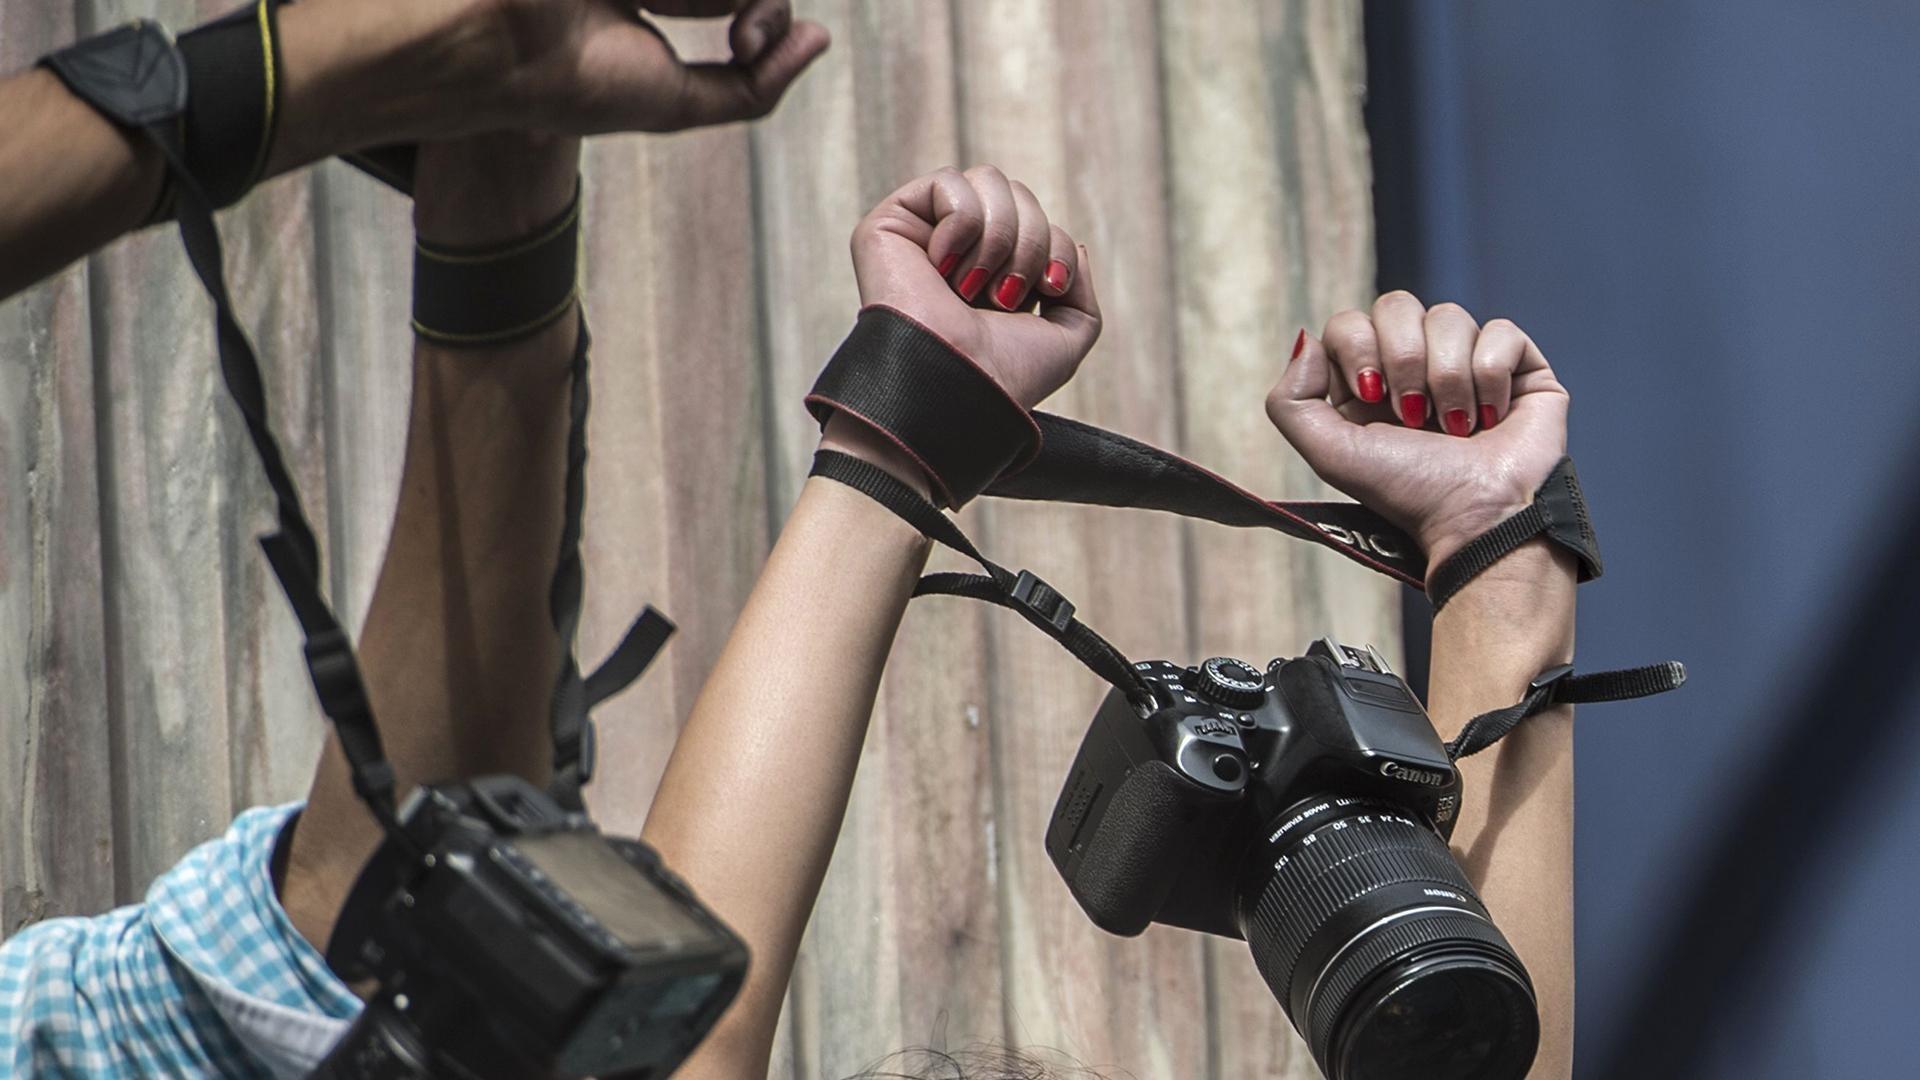 /admin/storage/photos/shares/detention of journalists.jpg